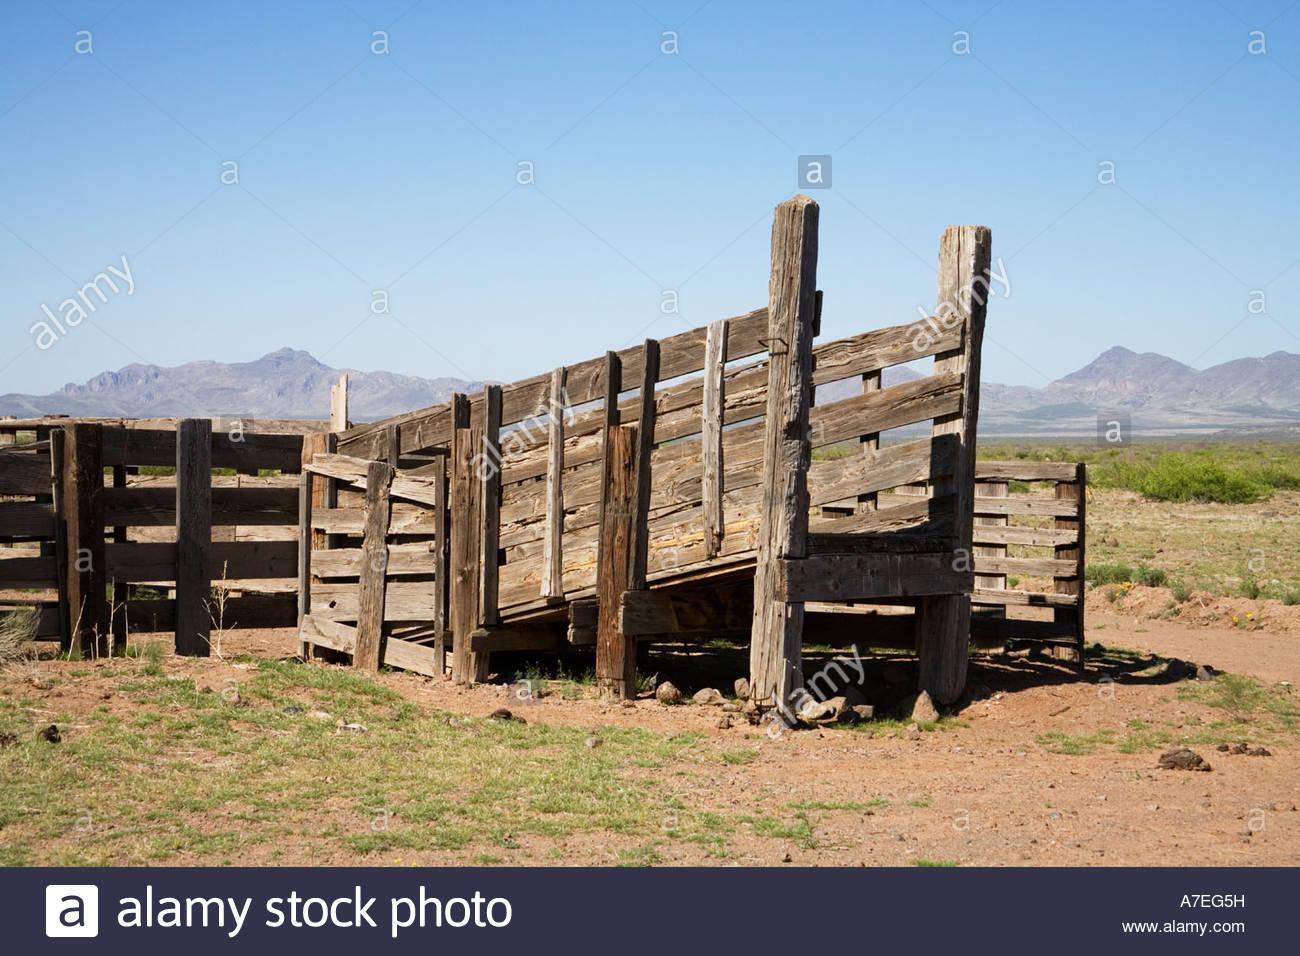 Livestock Loading Chute And Corral Stock Photos Livestock Loading